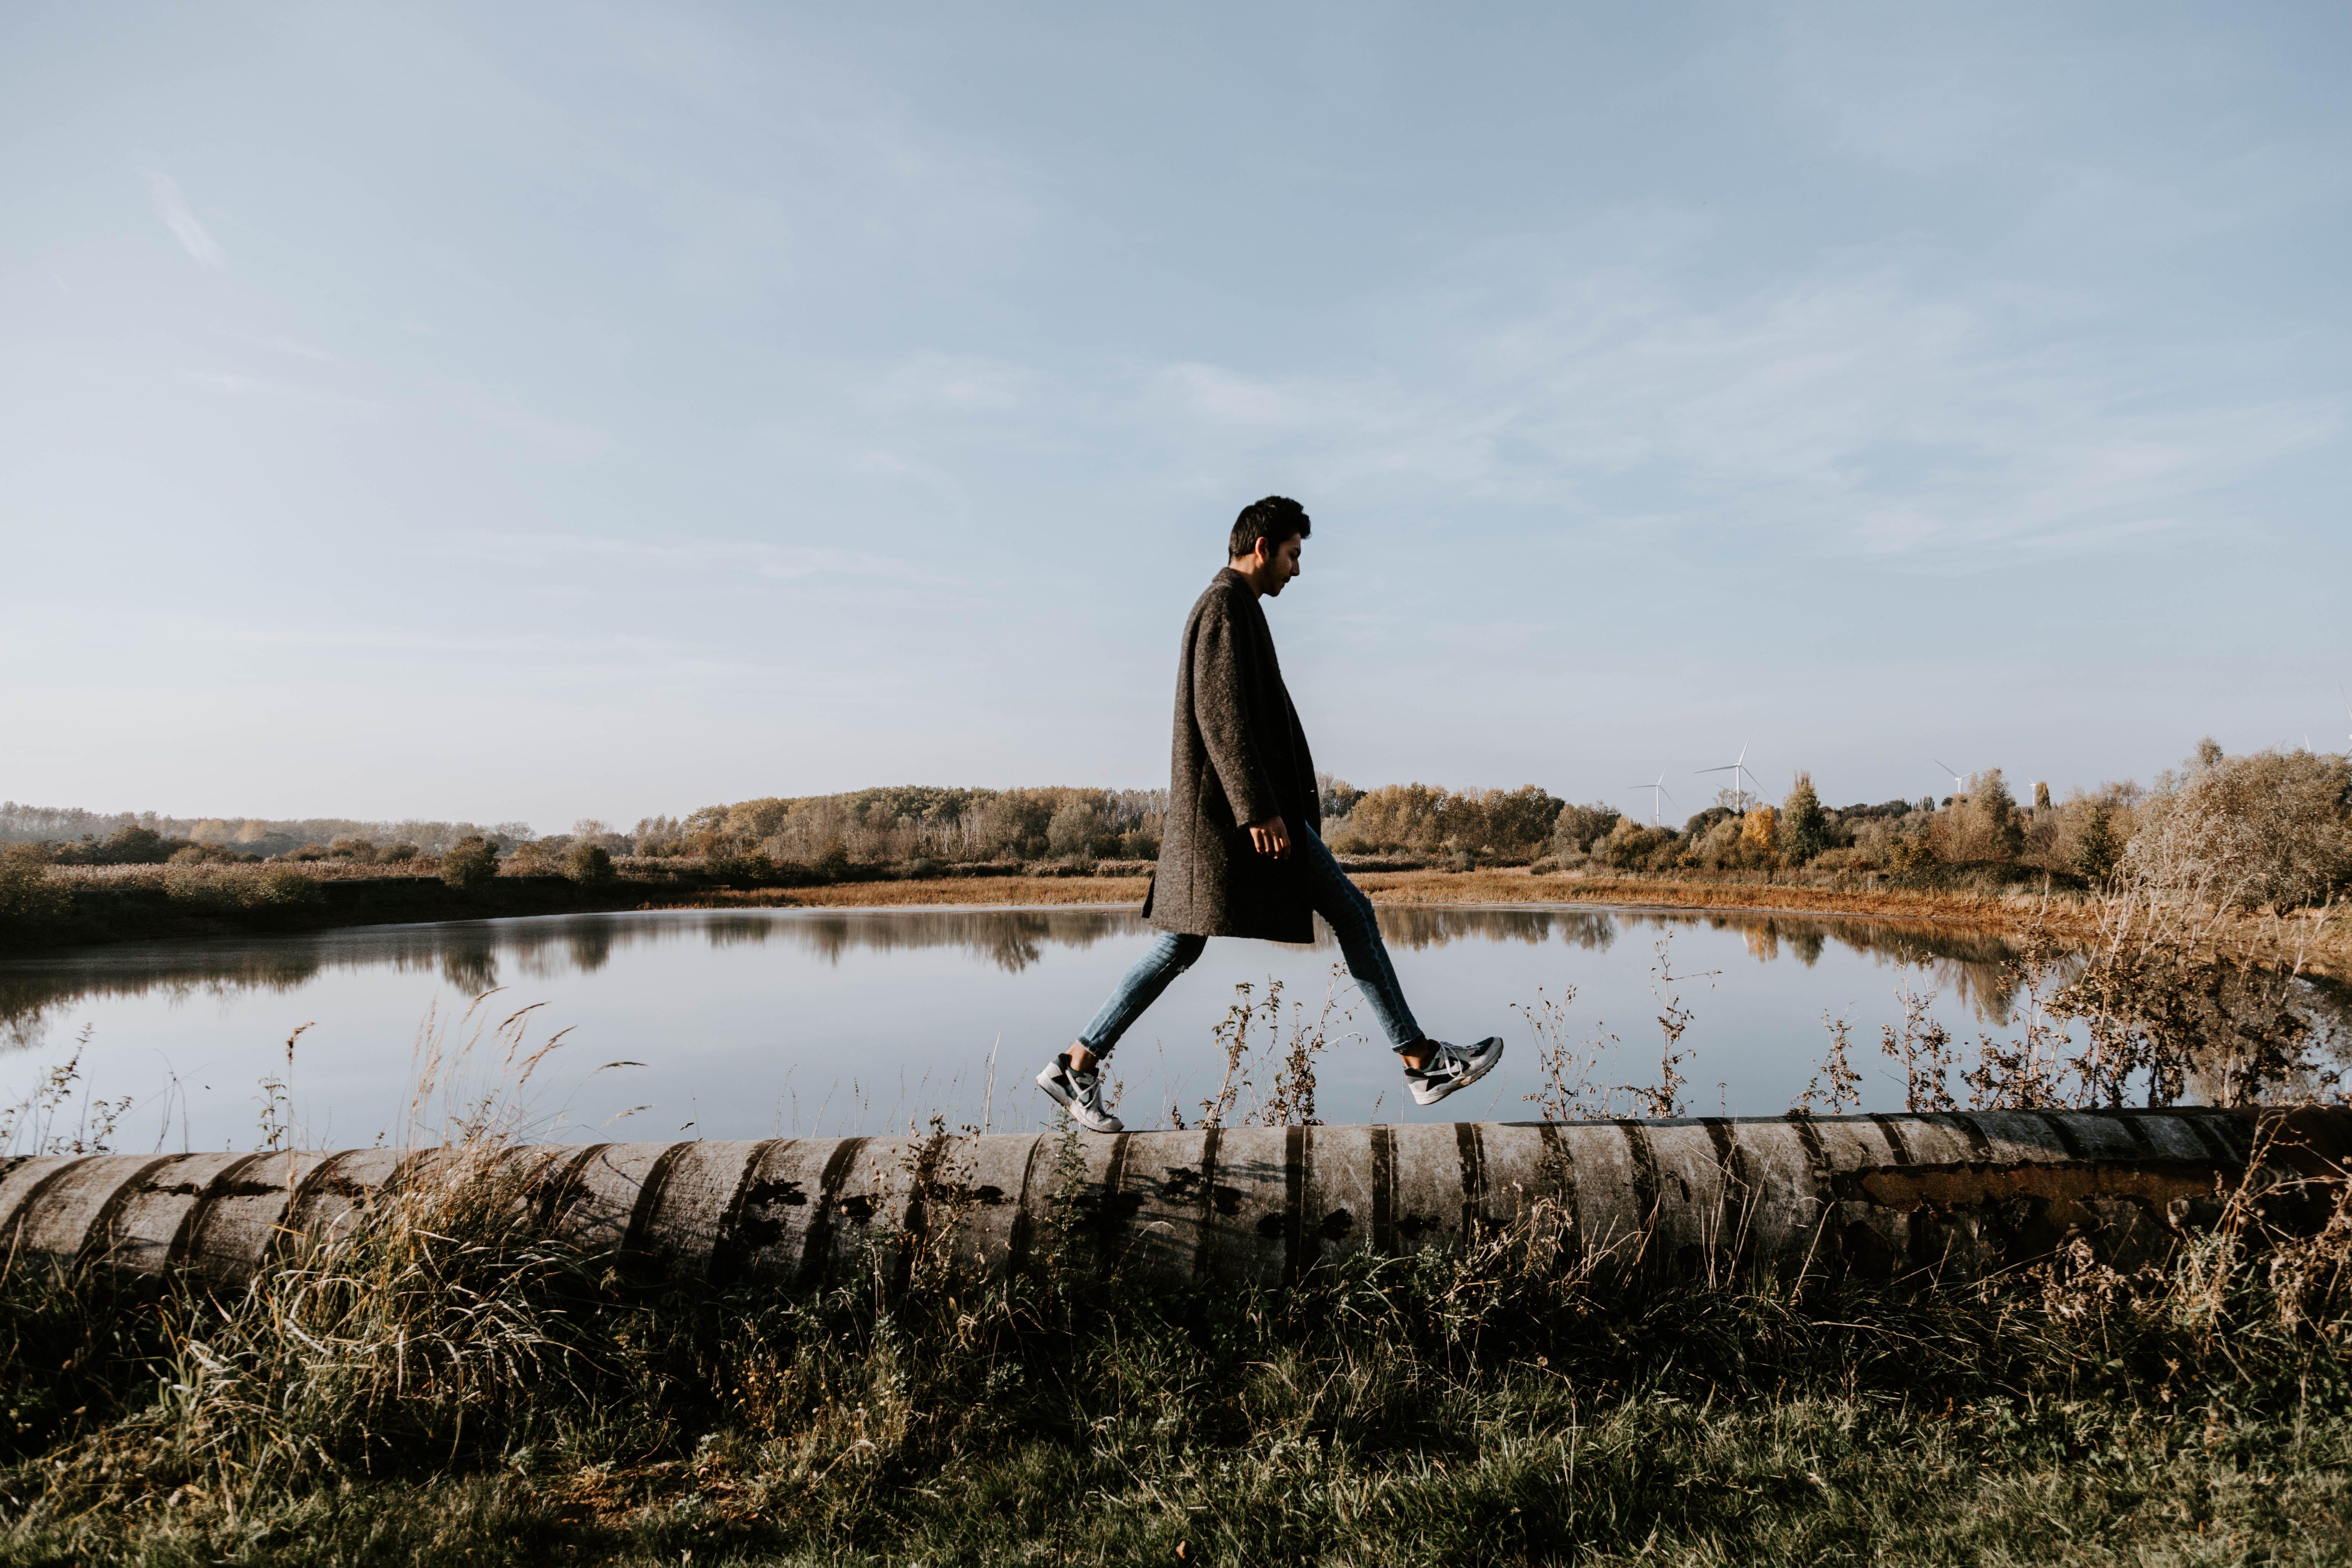 Man Walking on Concrete Pavement Near Body of Water